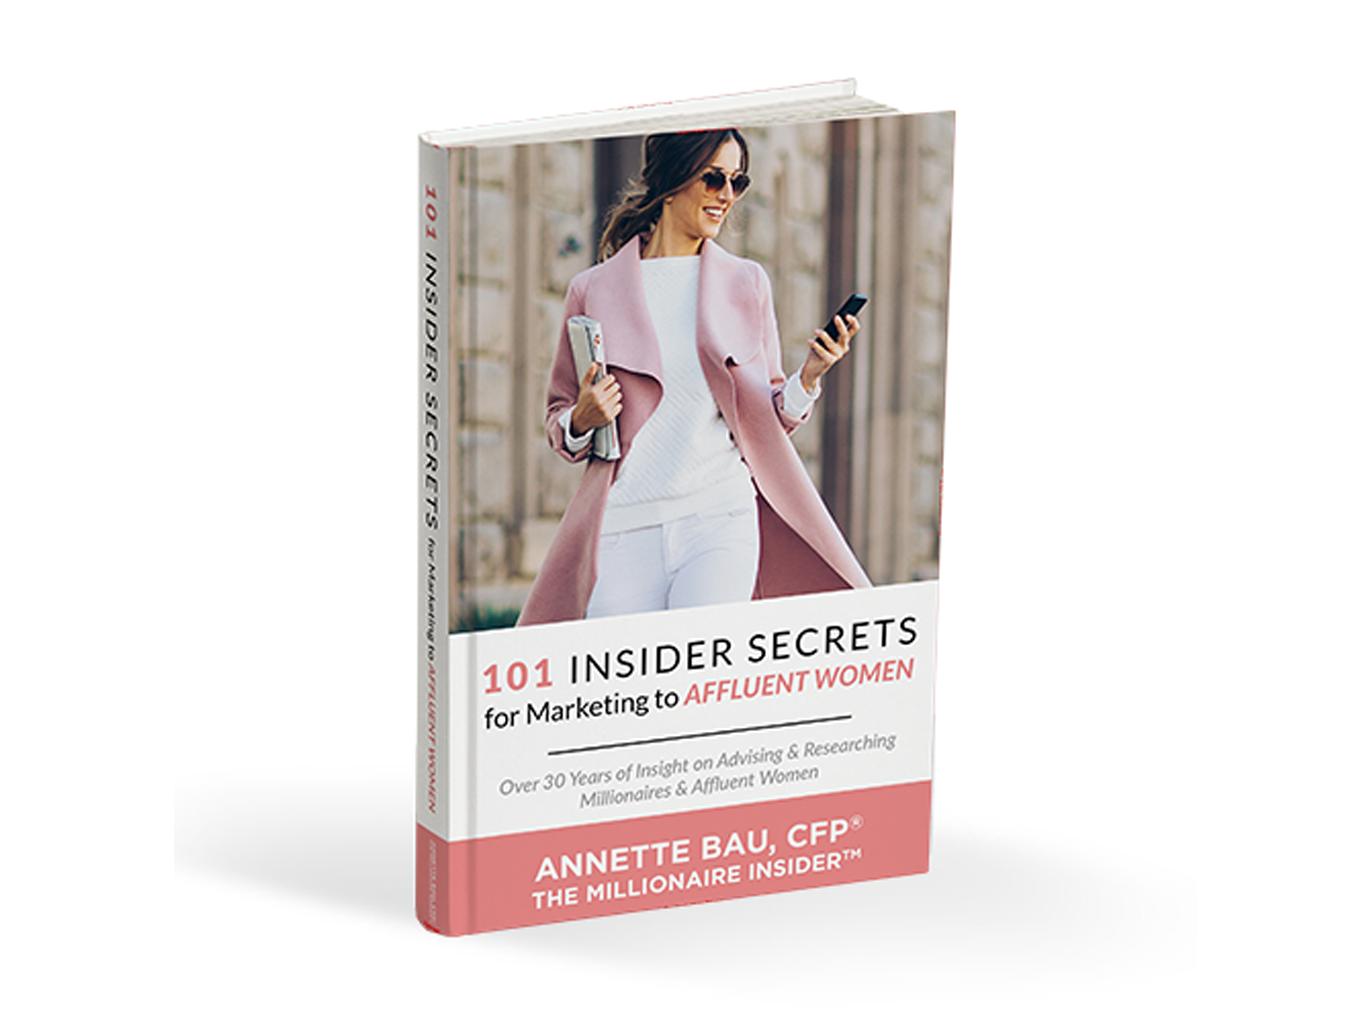 101 insider secrets for marketing to affluent women